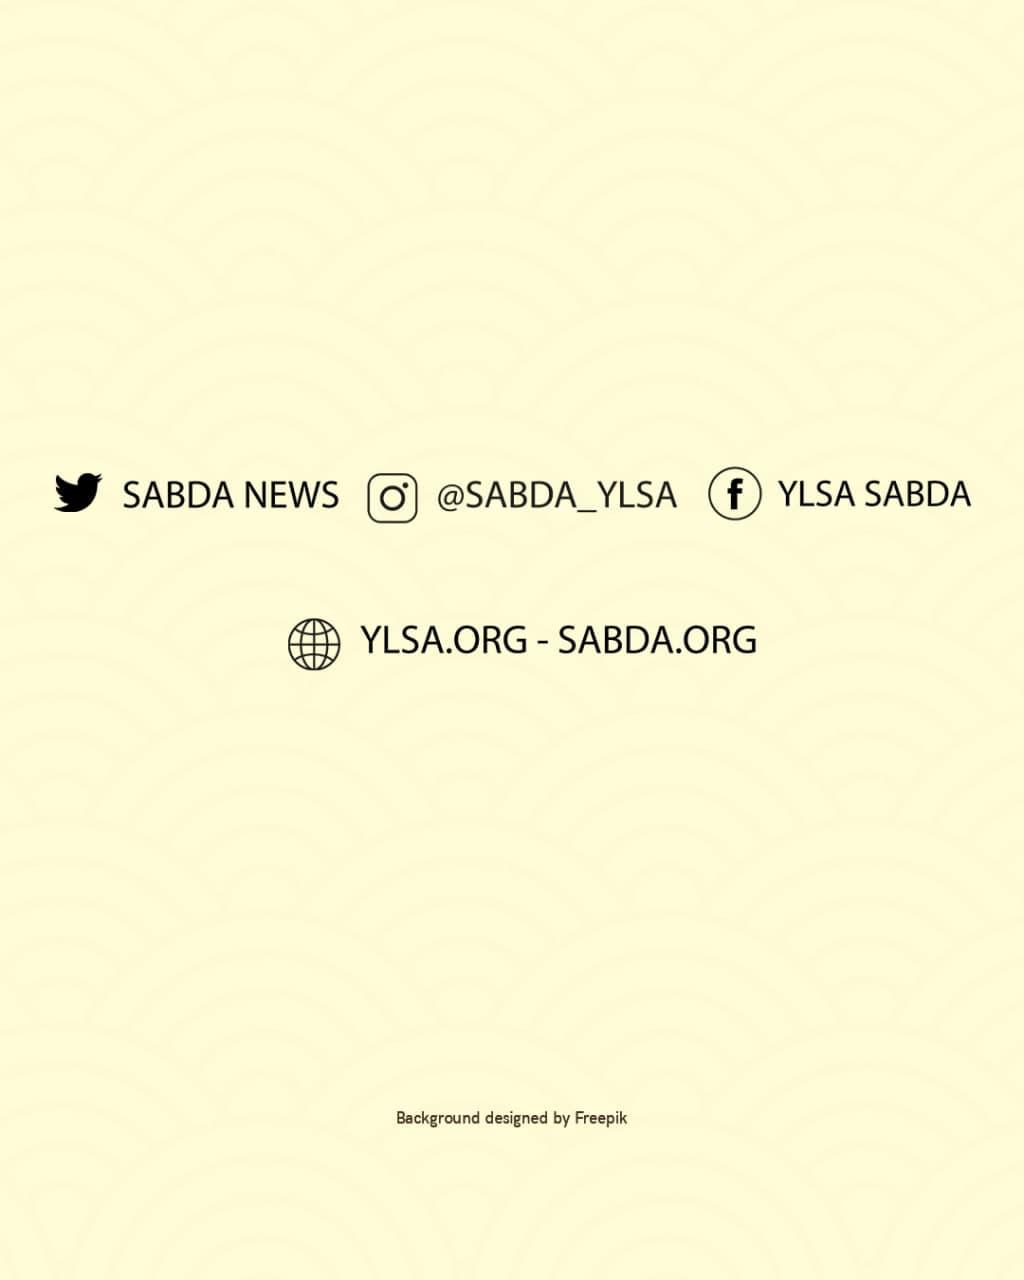 Sahabat SABDA bisa mengikuti perkembangan pelayanan YLSA melalui komunitas YLSA.